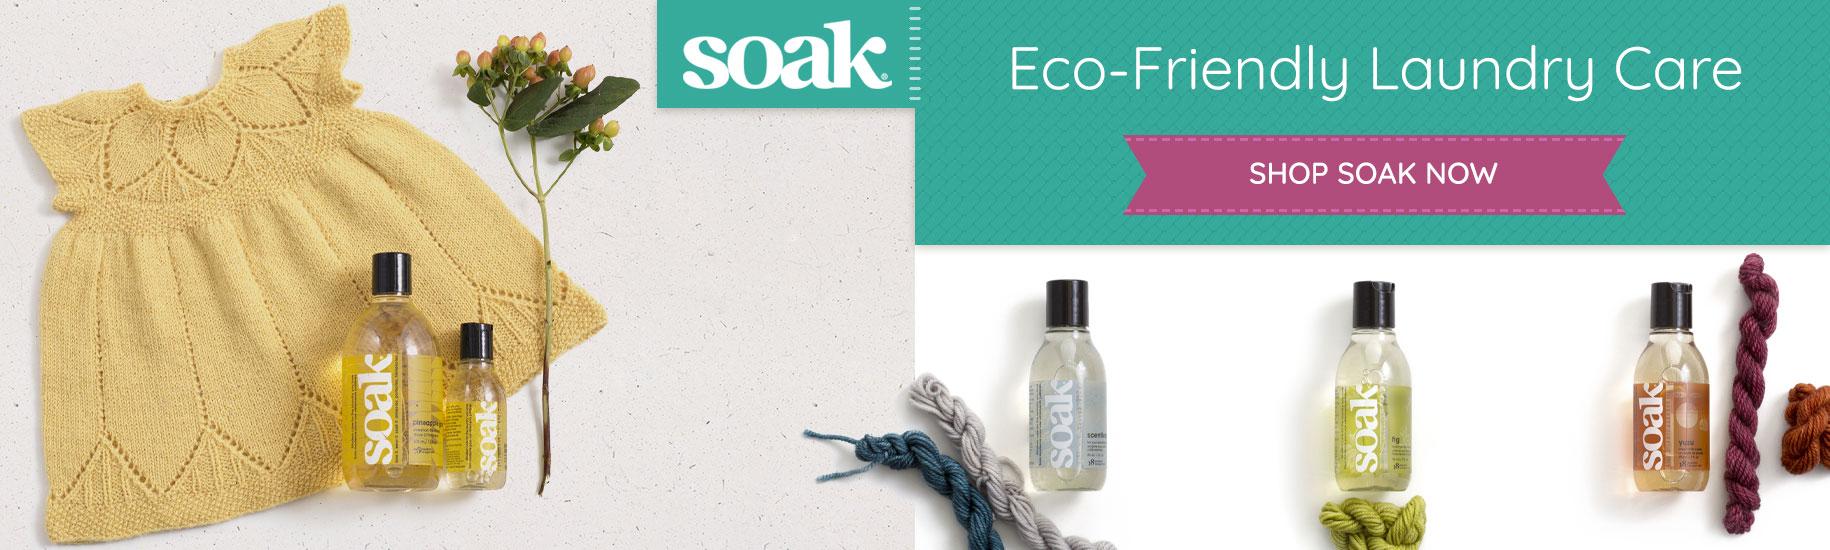 soak - Eco-friendly laundry care